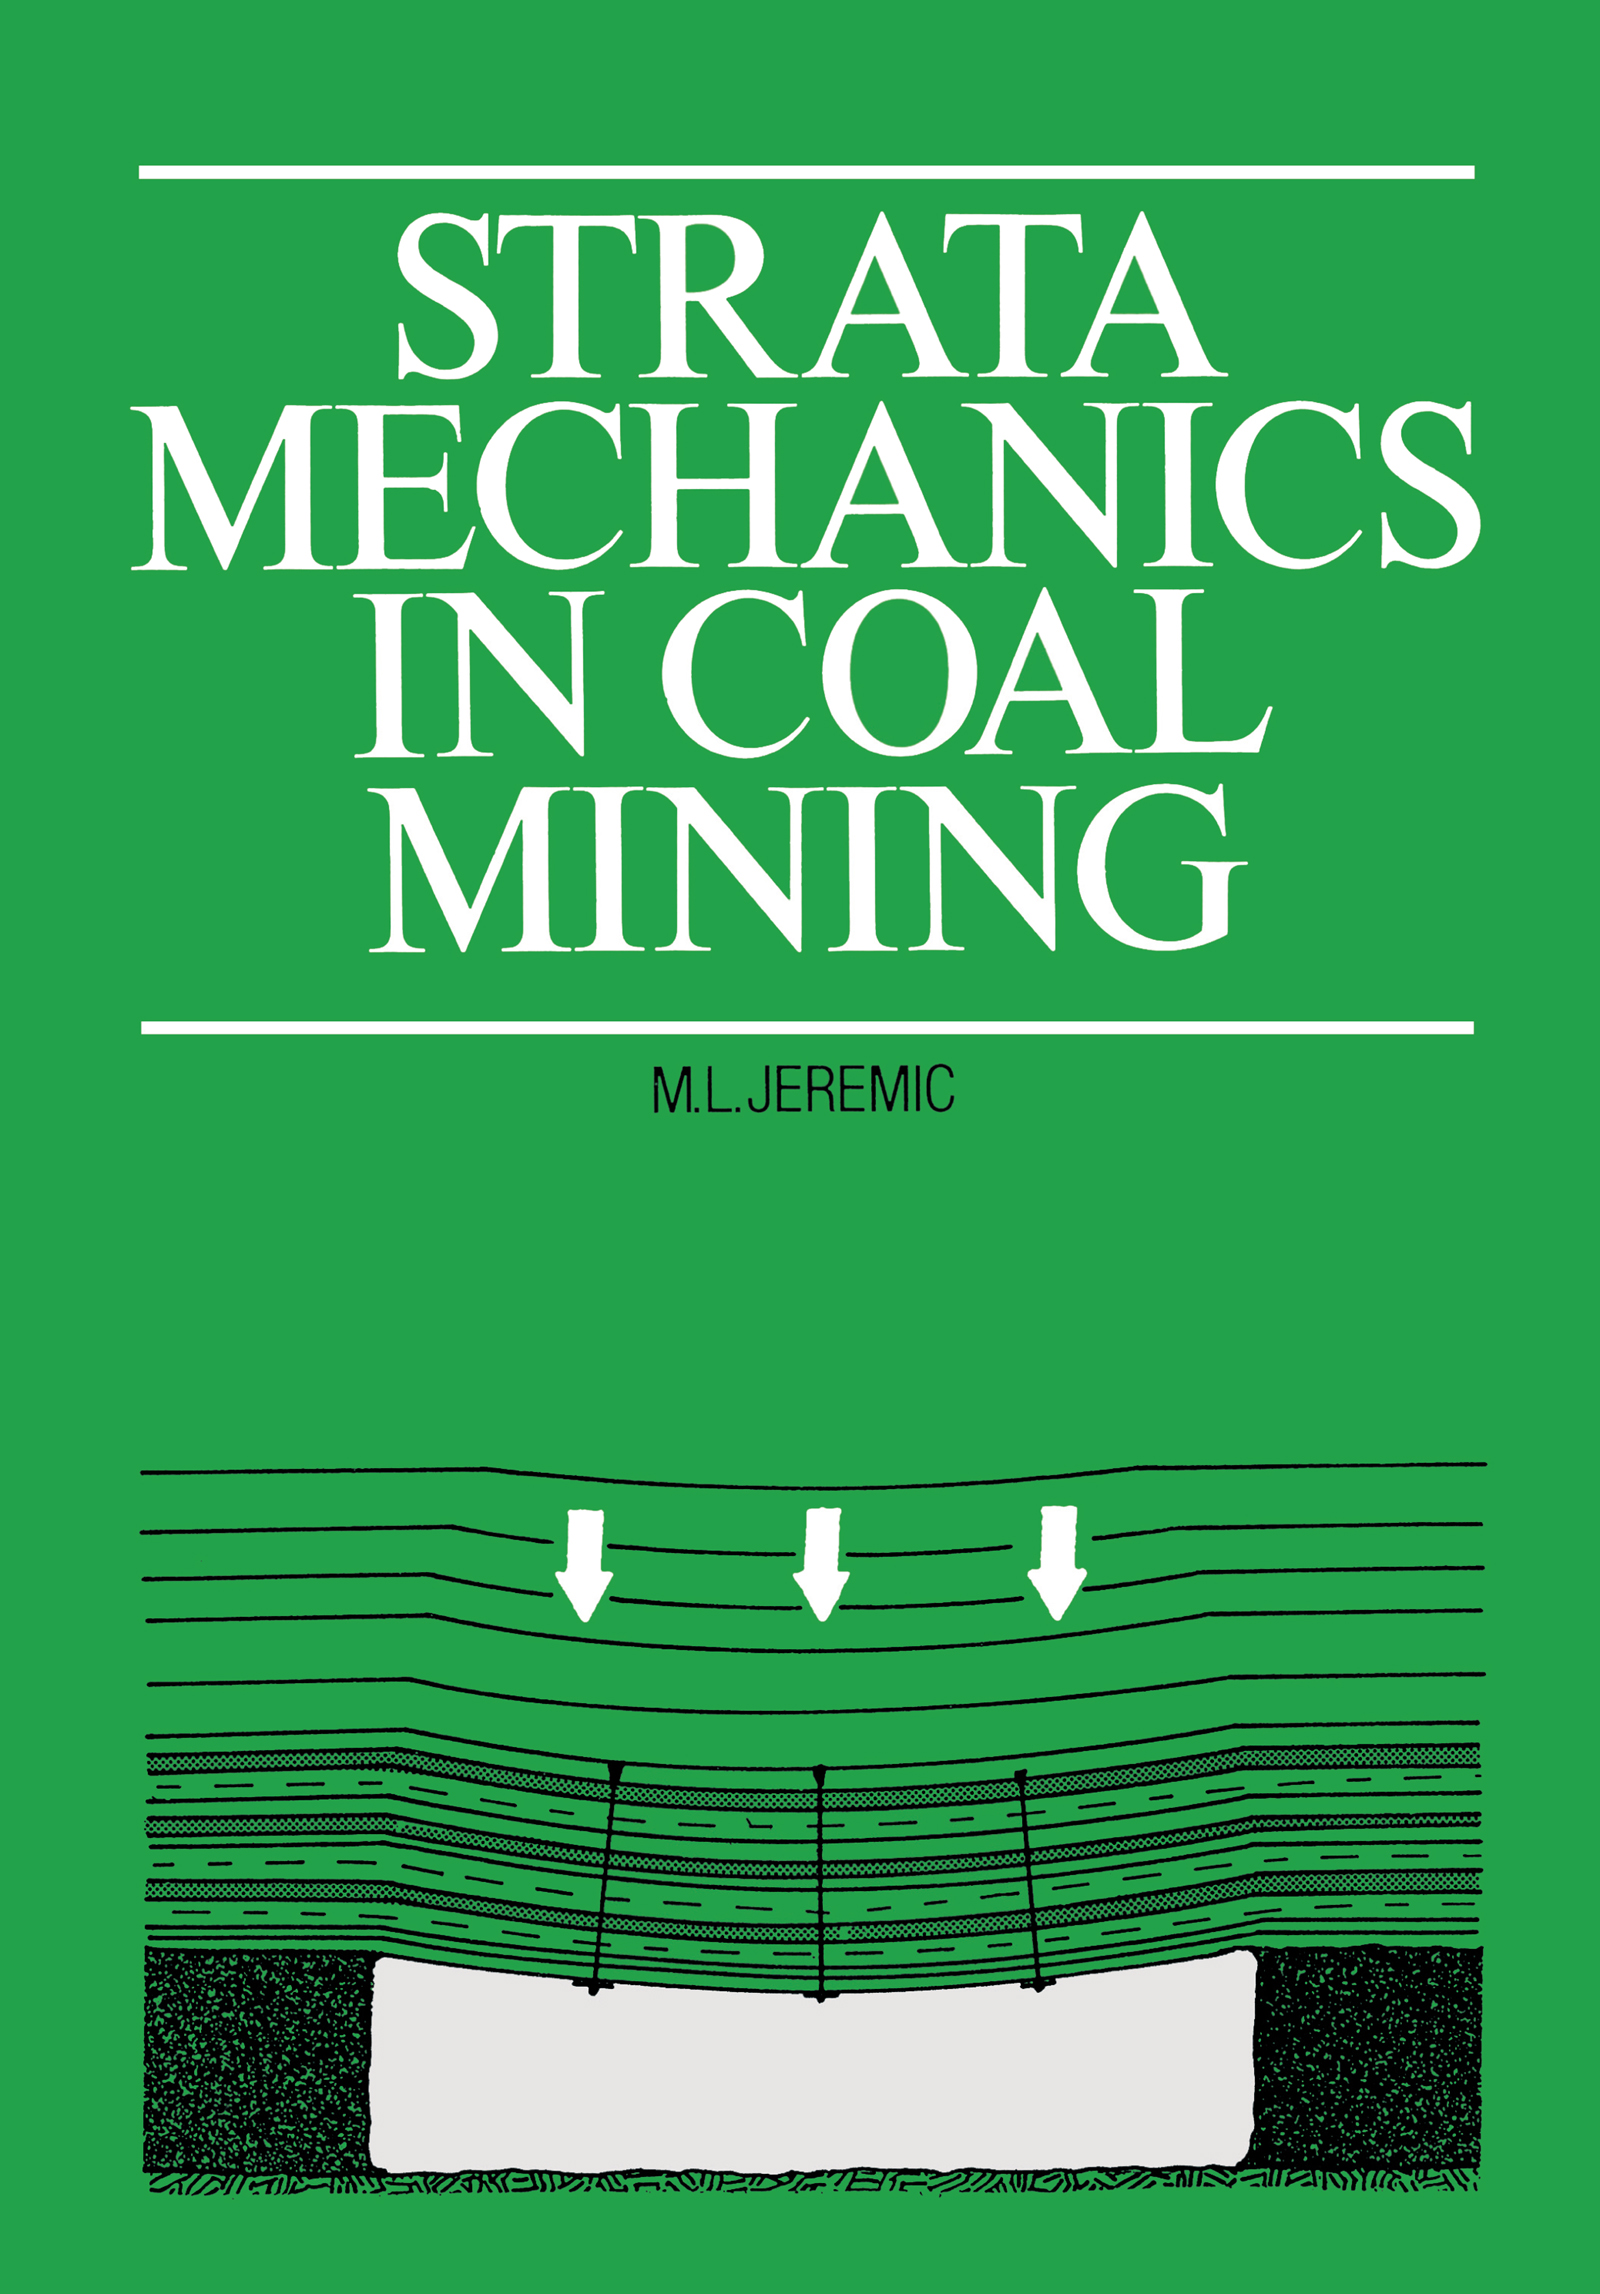 Strata Mechanics in Coal Mining